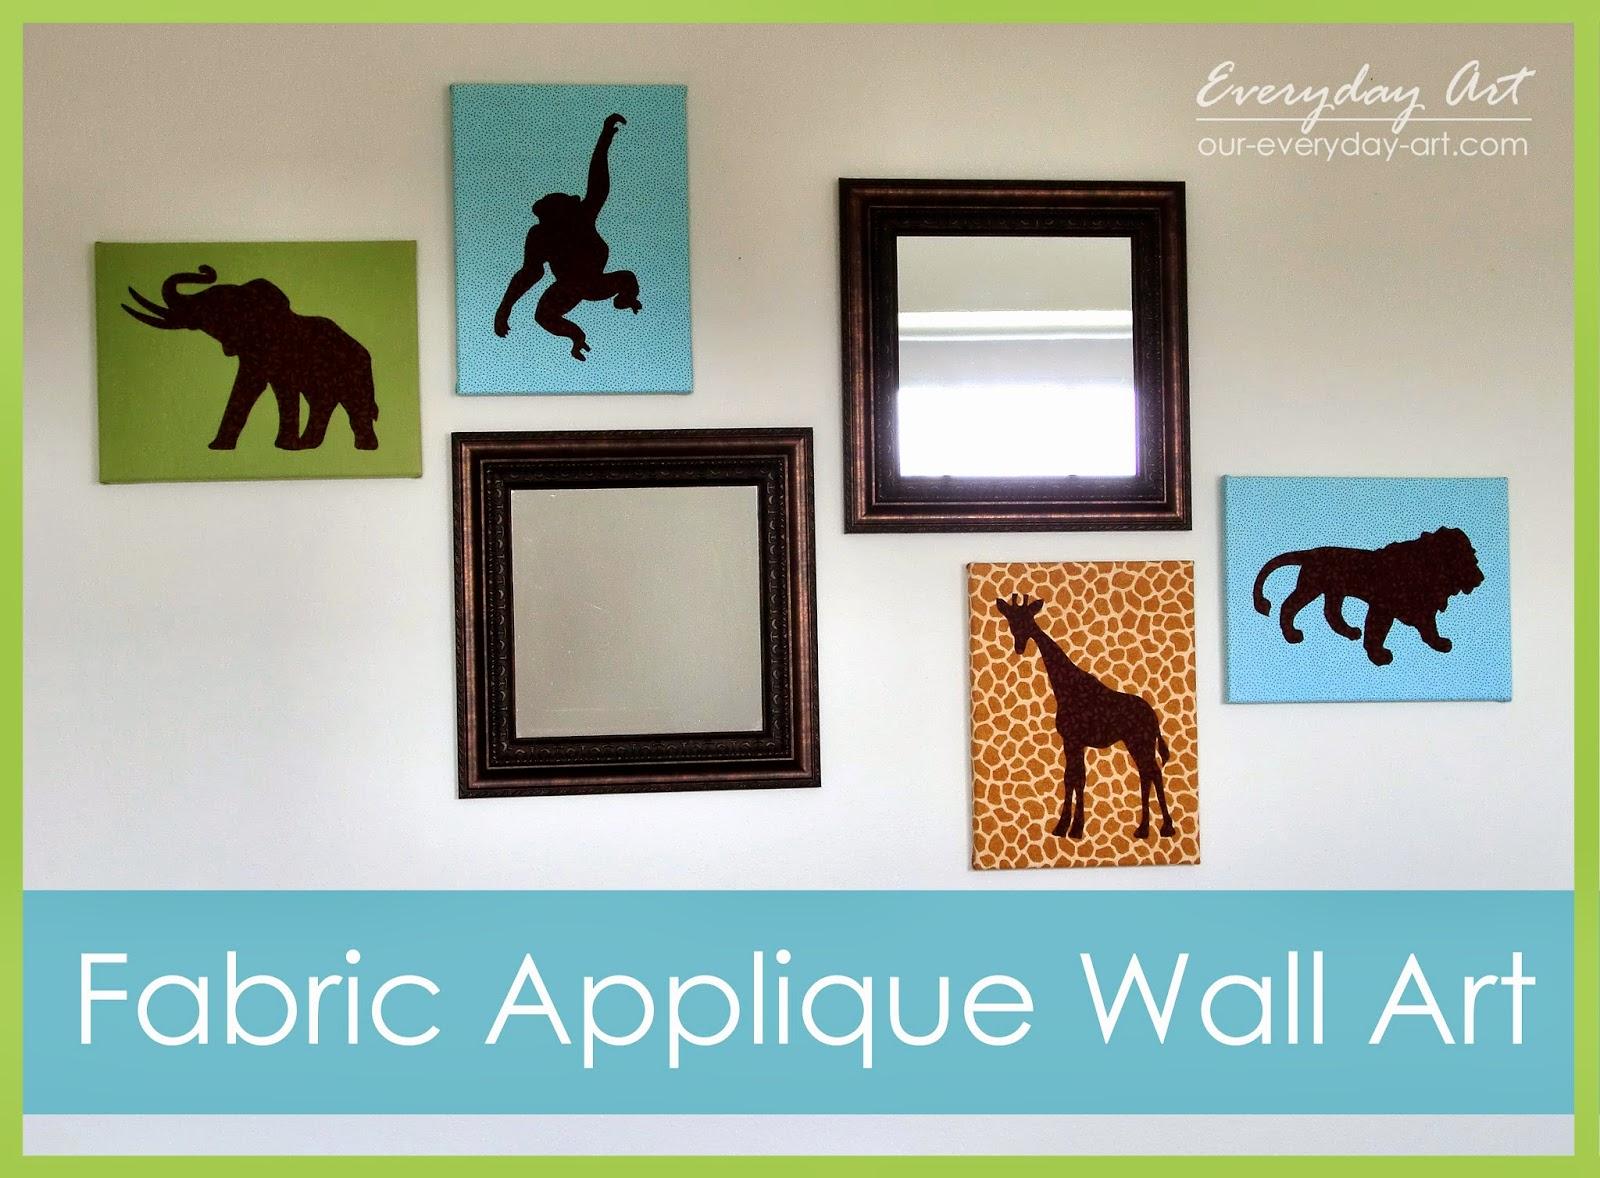 Everyday Art: Fabric Applique Wall Art